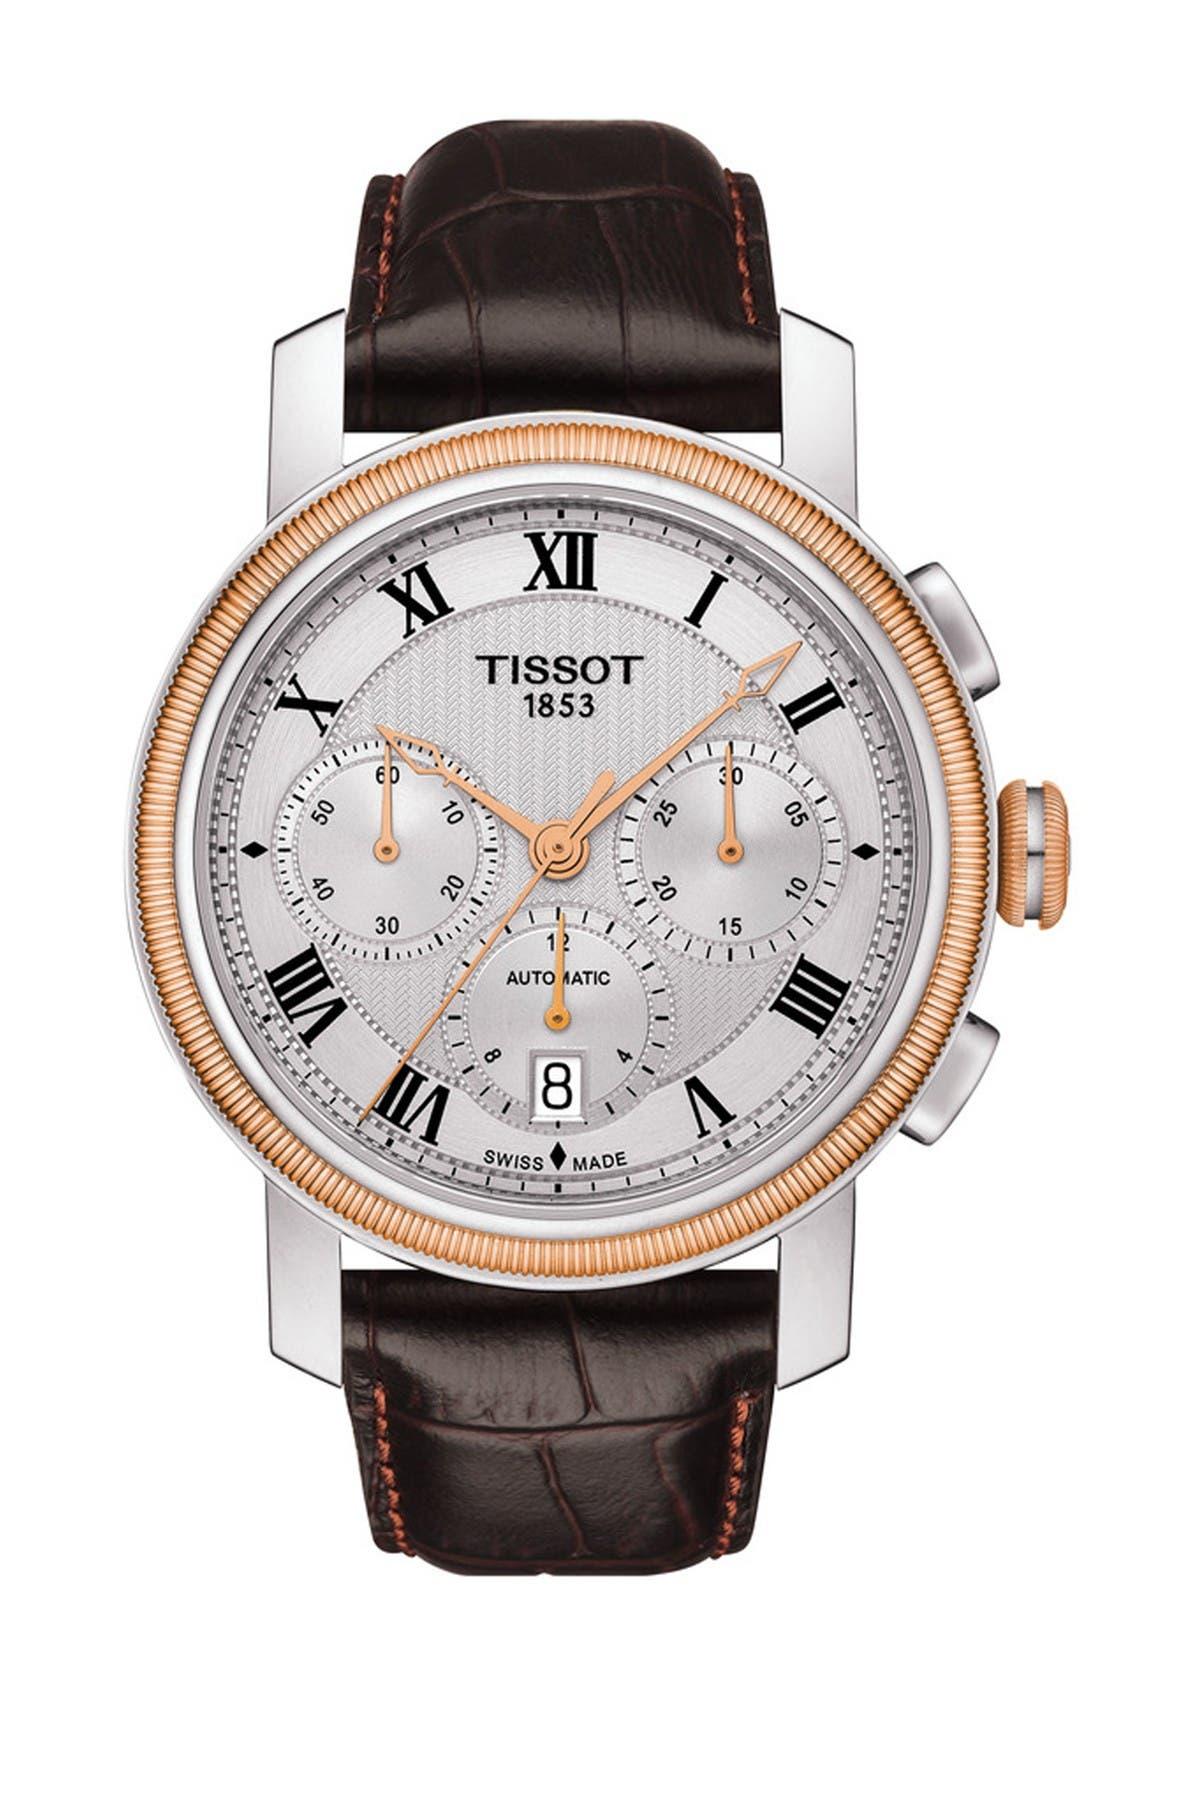 Image of Tissot Men's Bridgeport Automatic Chronograph Valjoux Swiss Leather Strap Watch, 42mm